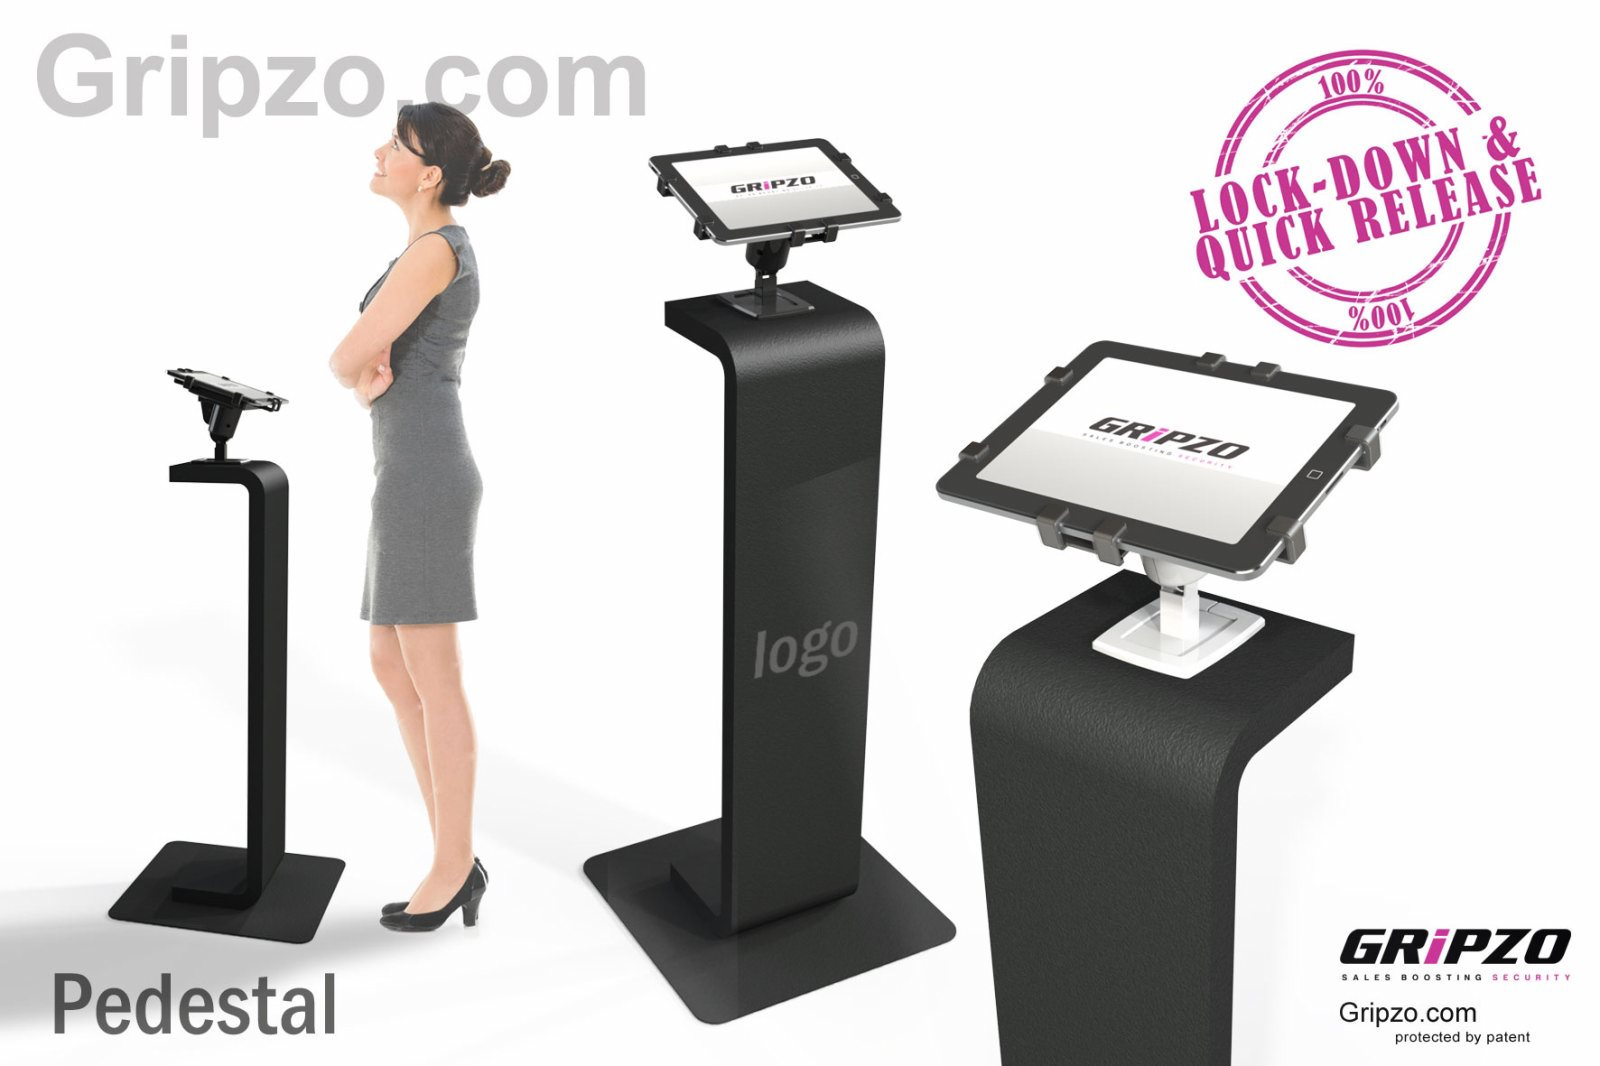 gripzo-pedestal-2.jpg